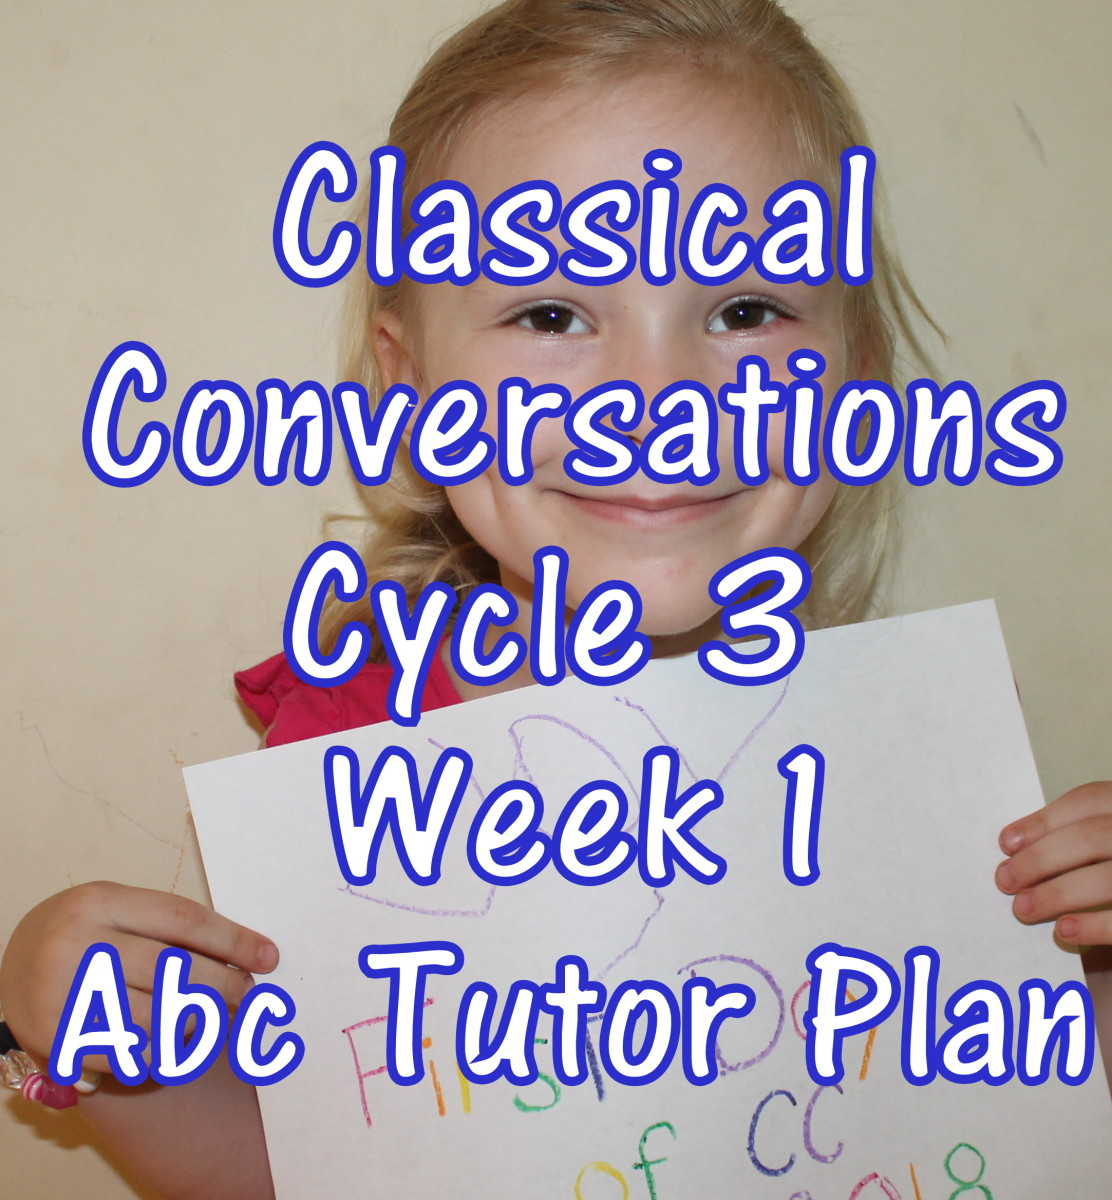 Classical Conversations CC Cycle 3 Week 1 Lesson for Abecedarians - CC C3W1